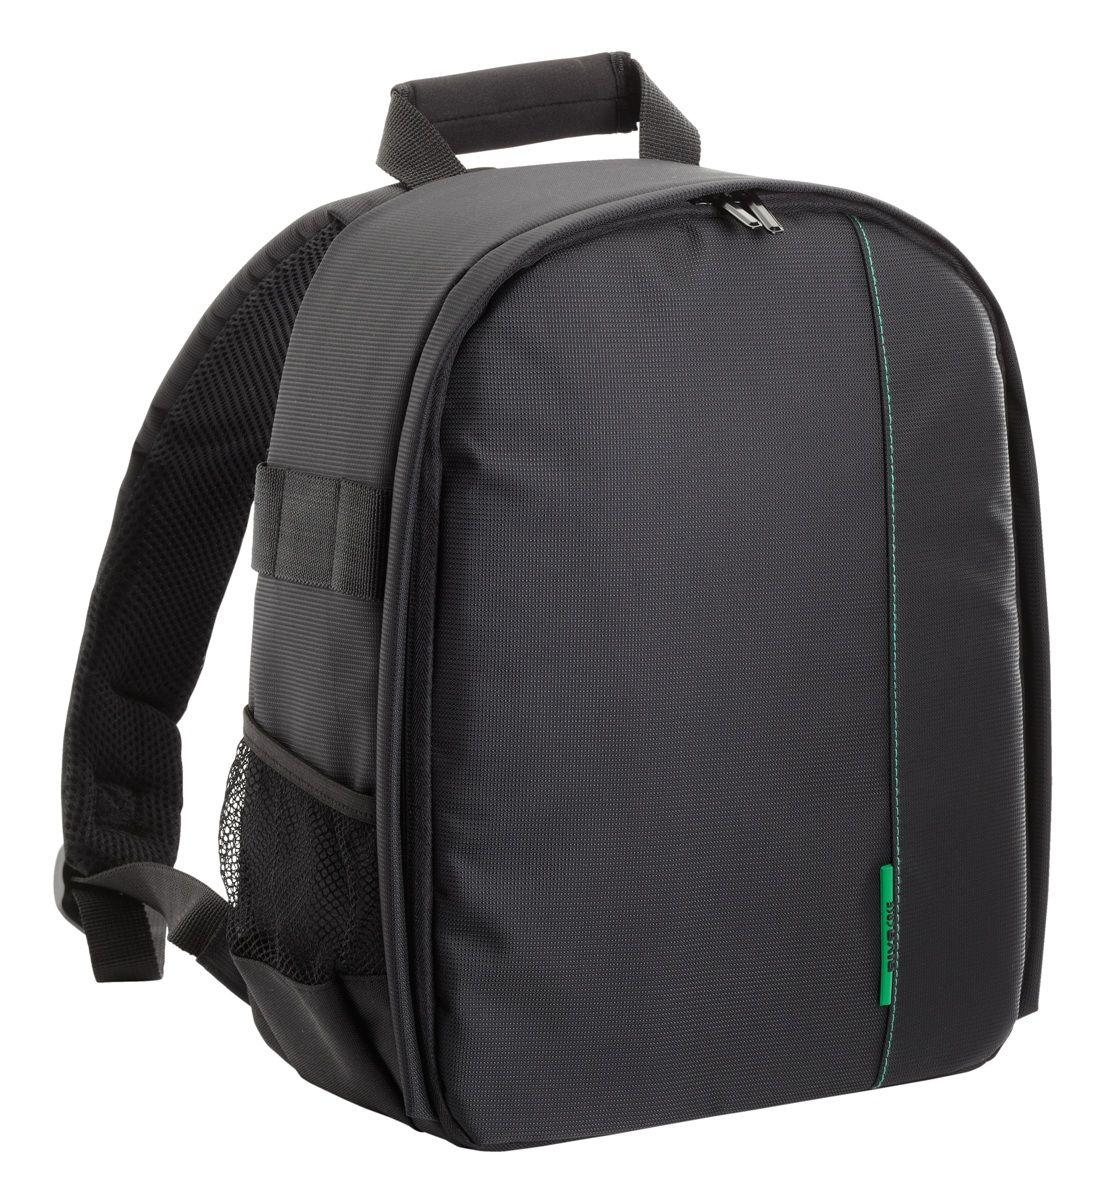 RIVACASE Riva 7460 SLR Backpack, Black рюкзак для зеркальной фотокамеры 6469